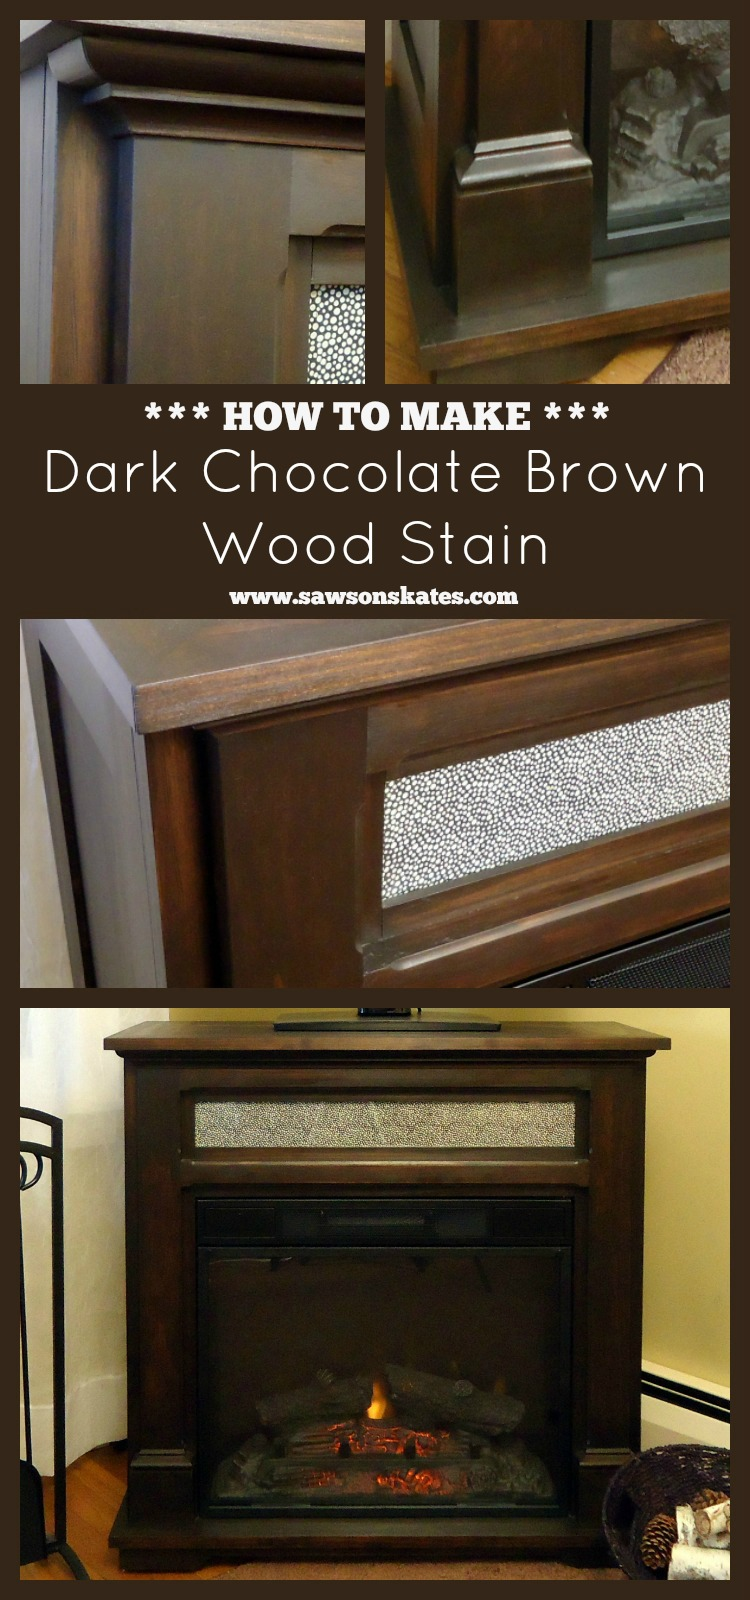 diy dark chocolate brown wood stain. Black Bedroom Furniture Sets. Home Design Ideas